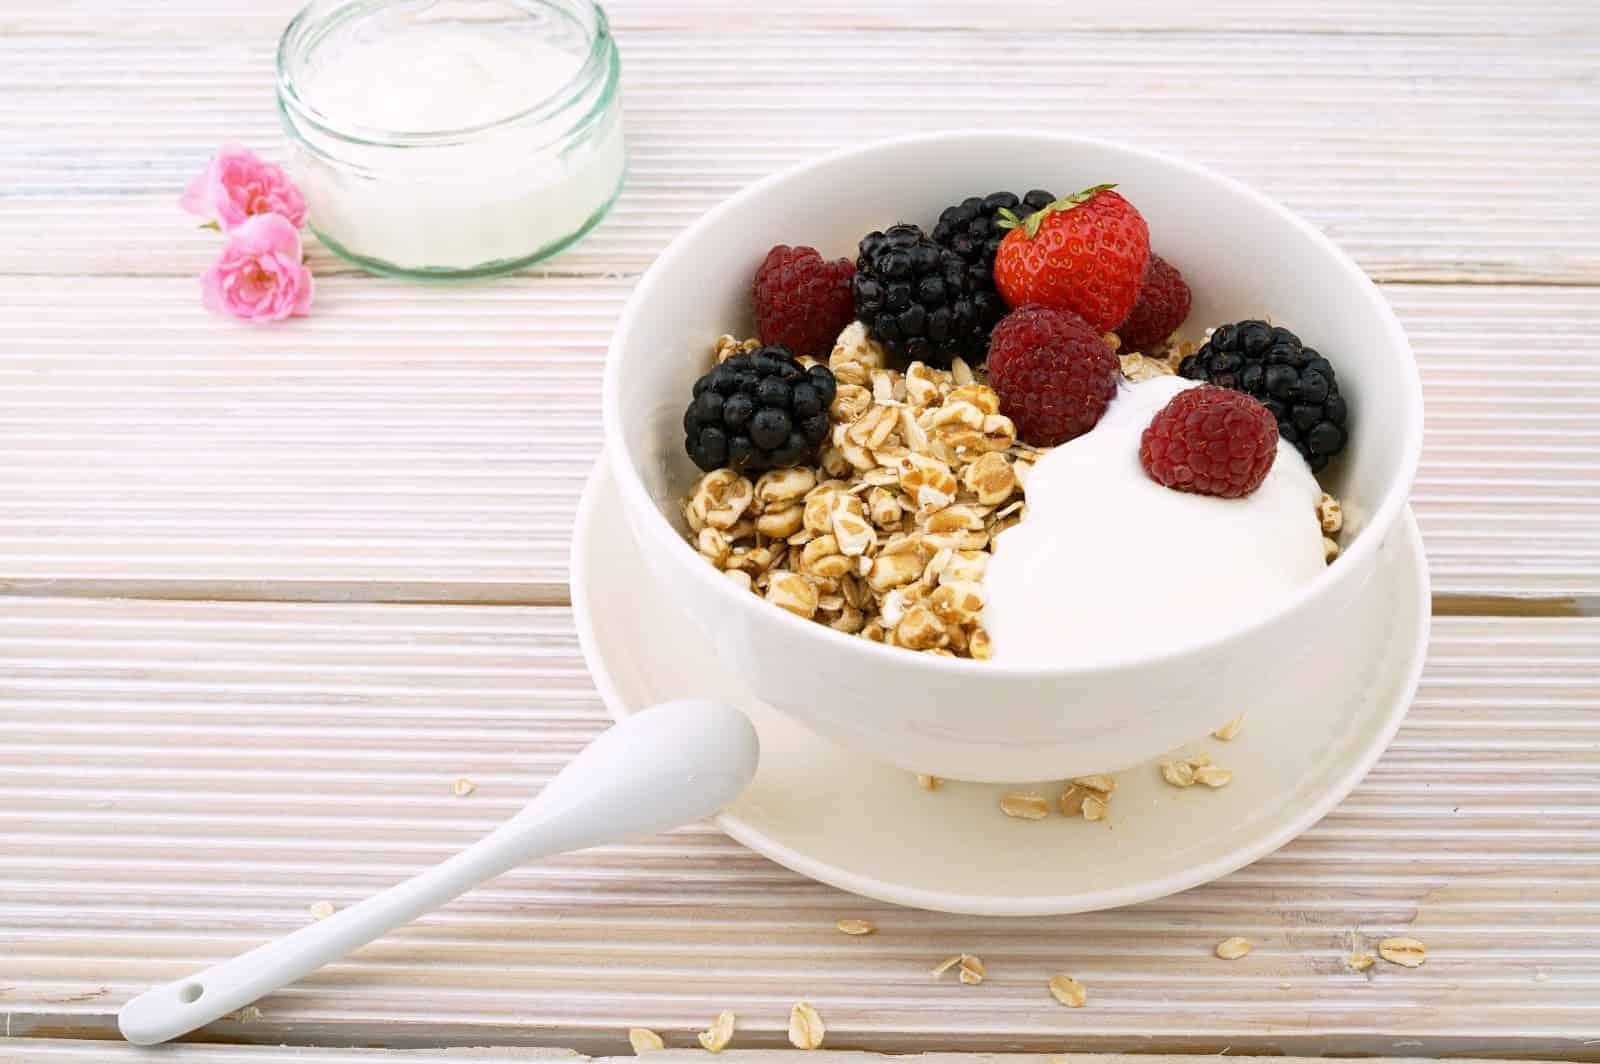 Healthy-looking bowl of fruit and yogurt.